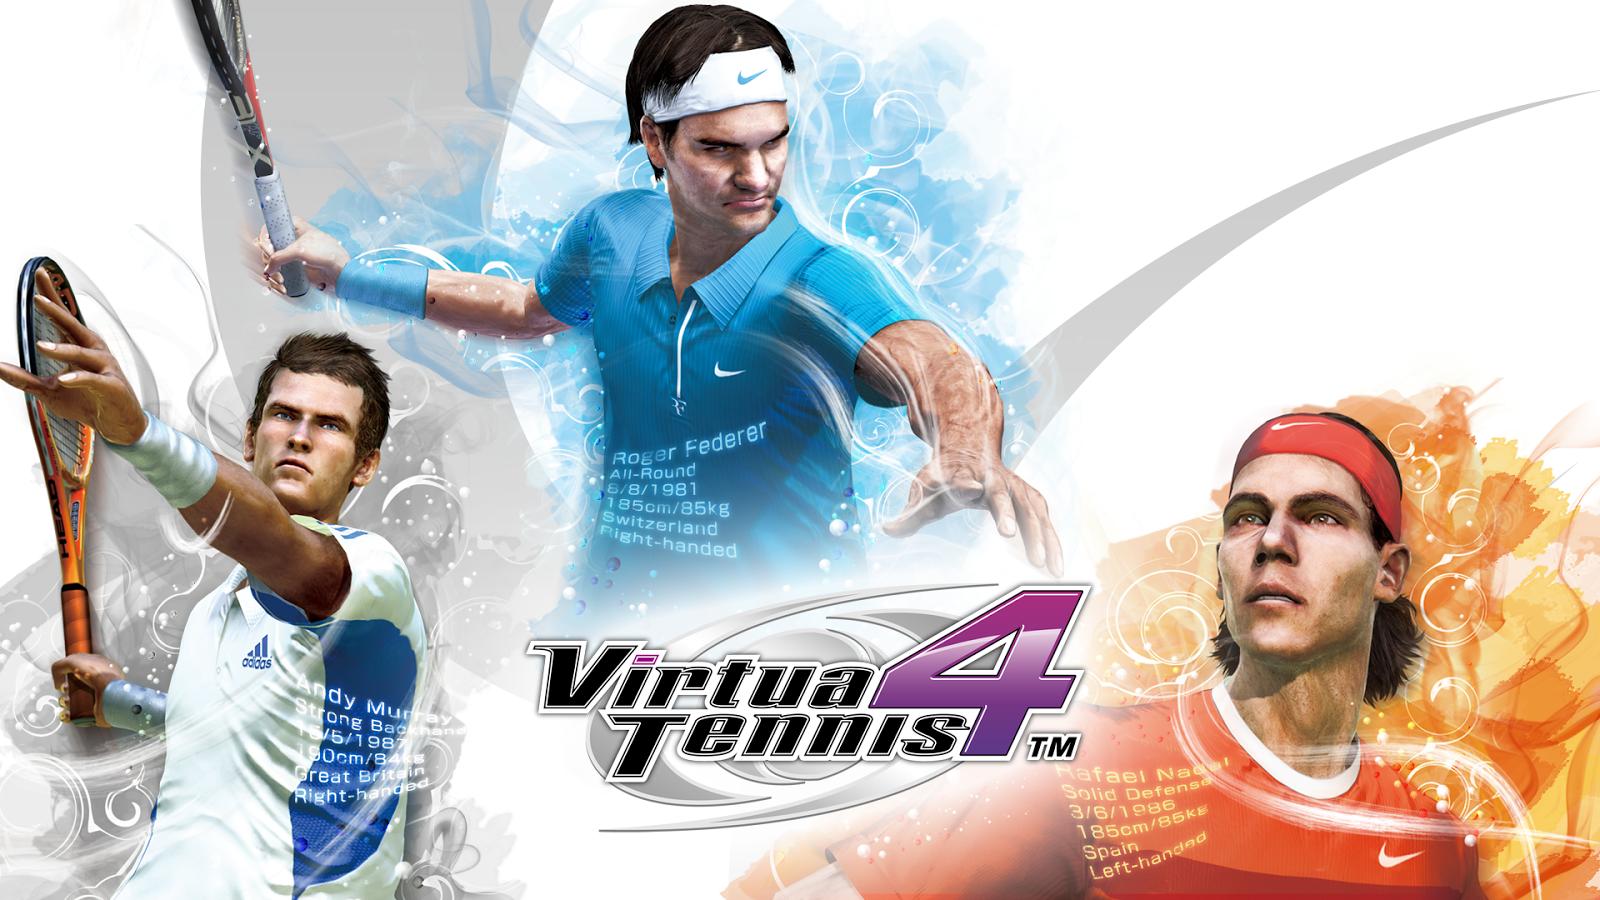 Virtua Tennis 4 Free Download 171 Igggames